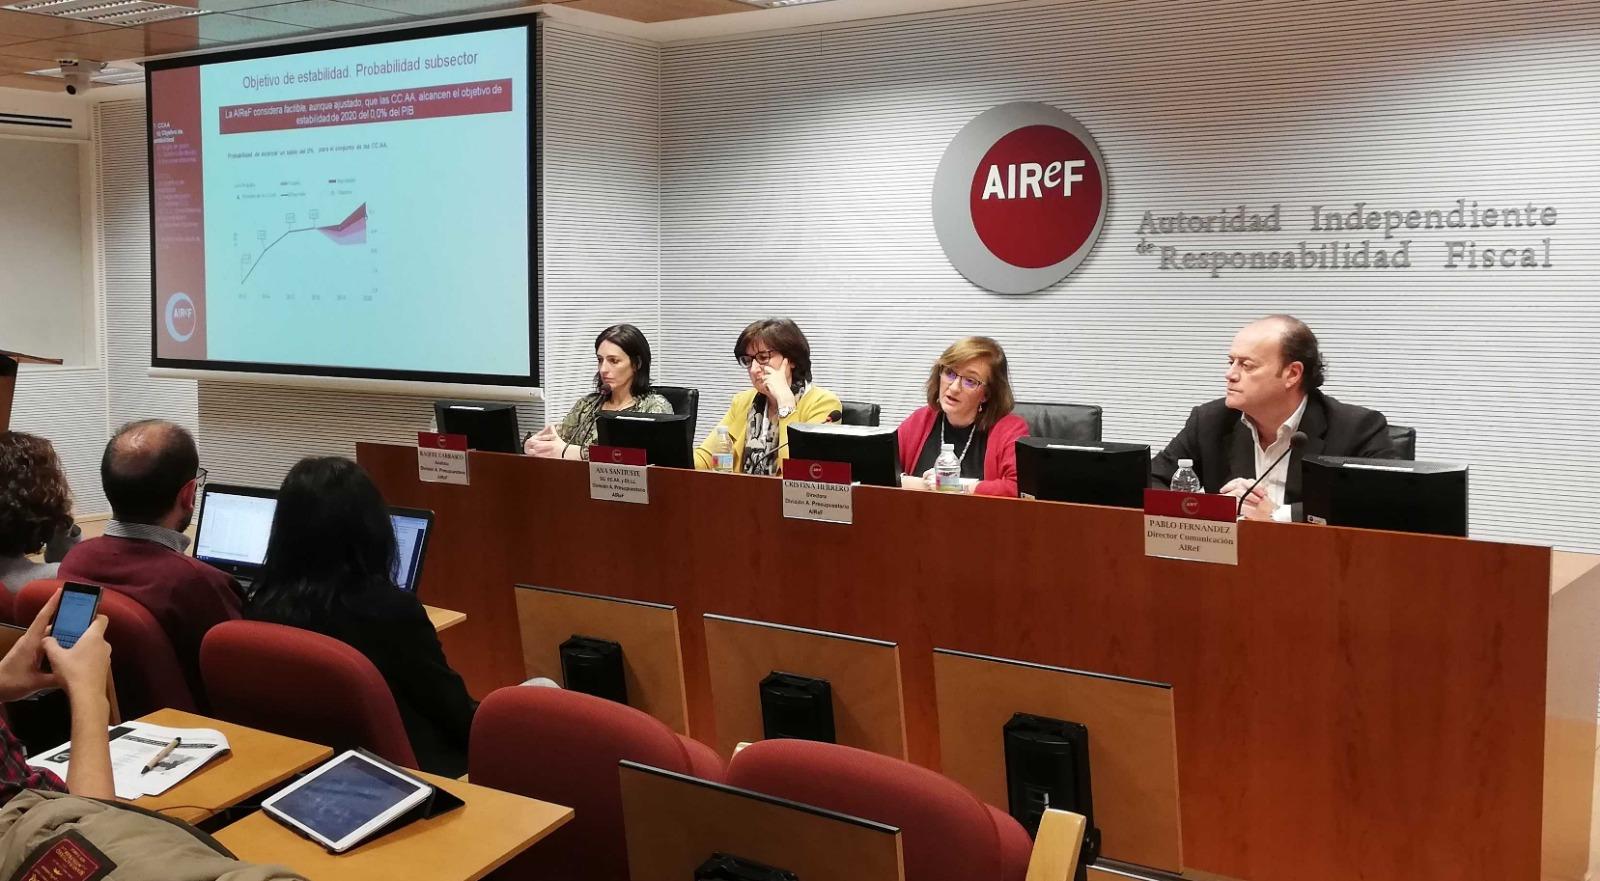 Interim president of AIReF, Cristina Herrero